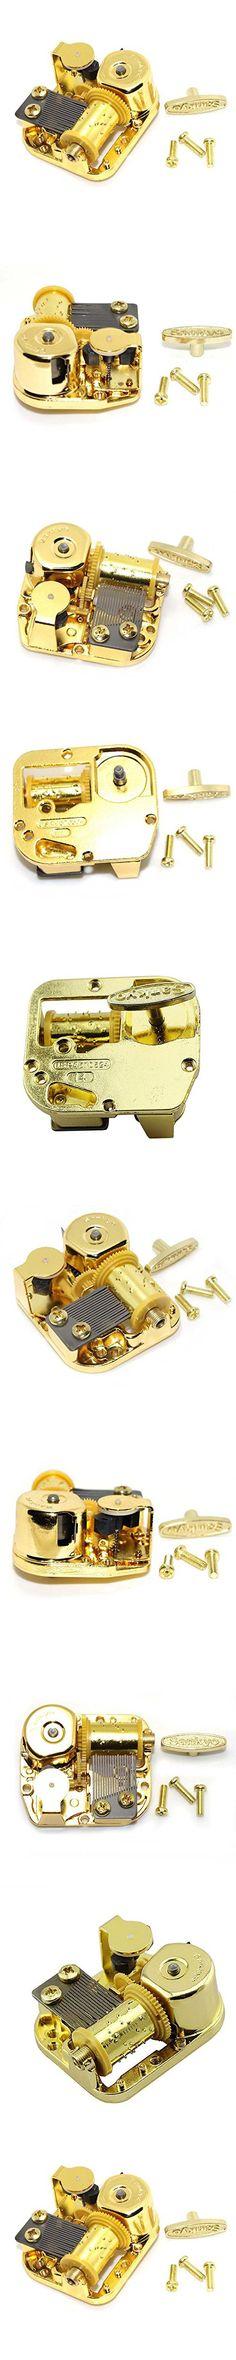 Gold Plated Windup Clockwork DIY Music Box Musical Mechanism Movement (Grandfather's Clock)